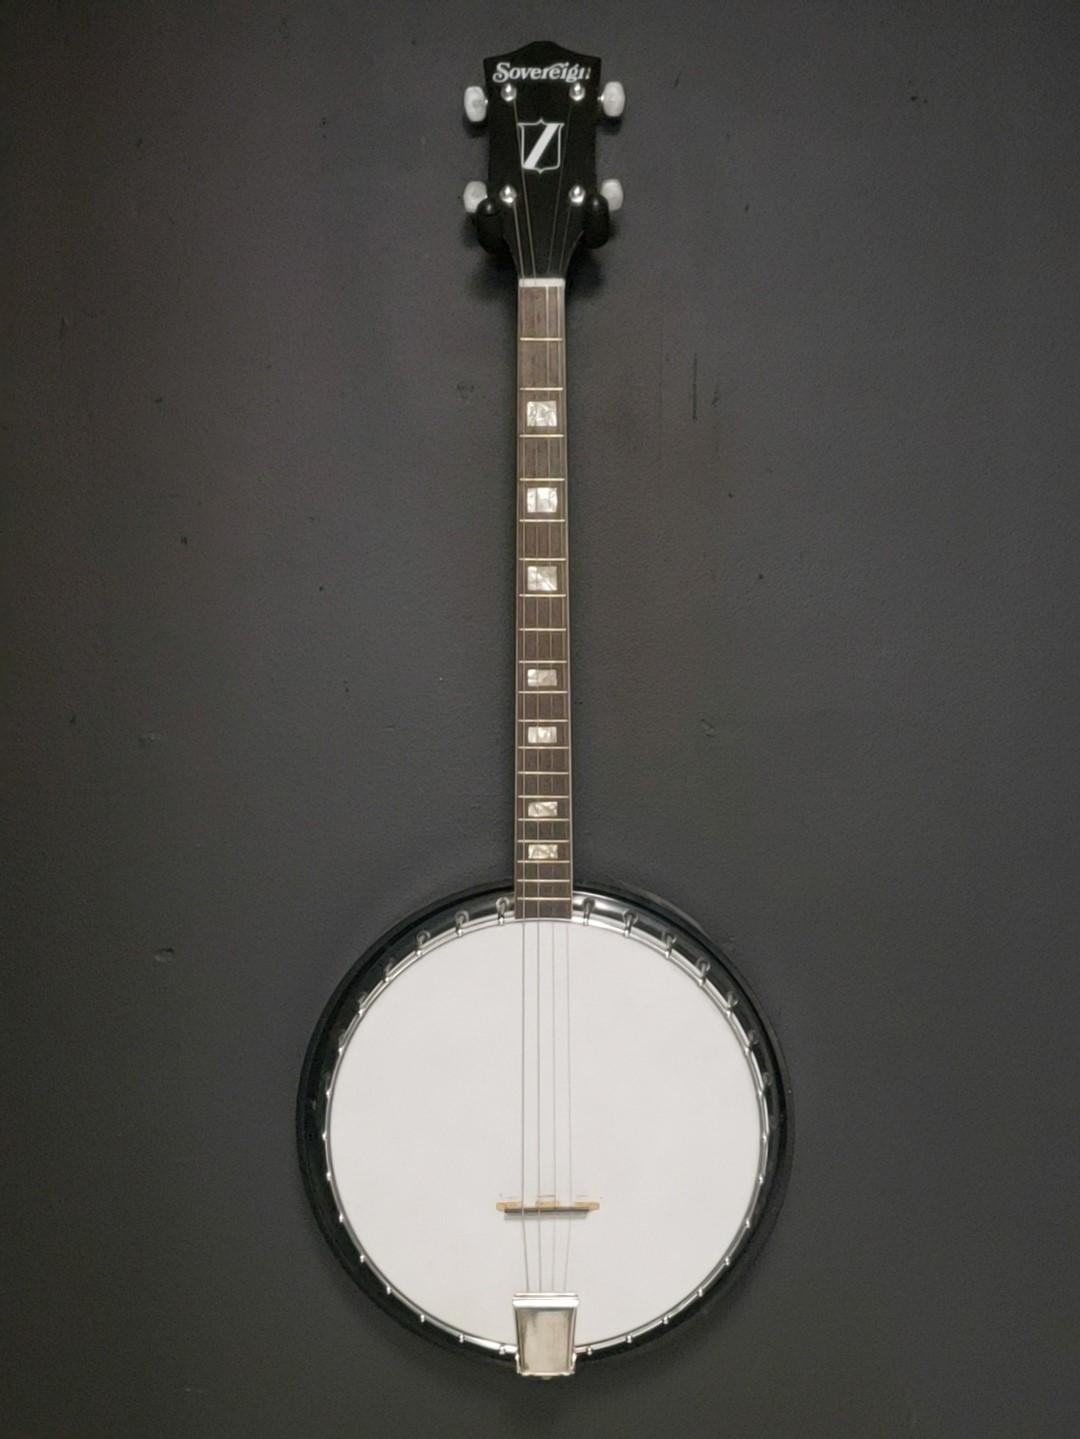 Sovereign 4 String Tenor Banjo